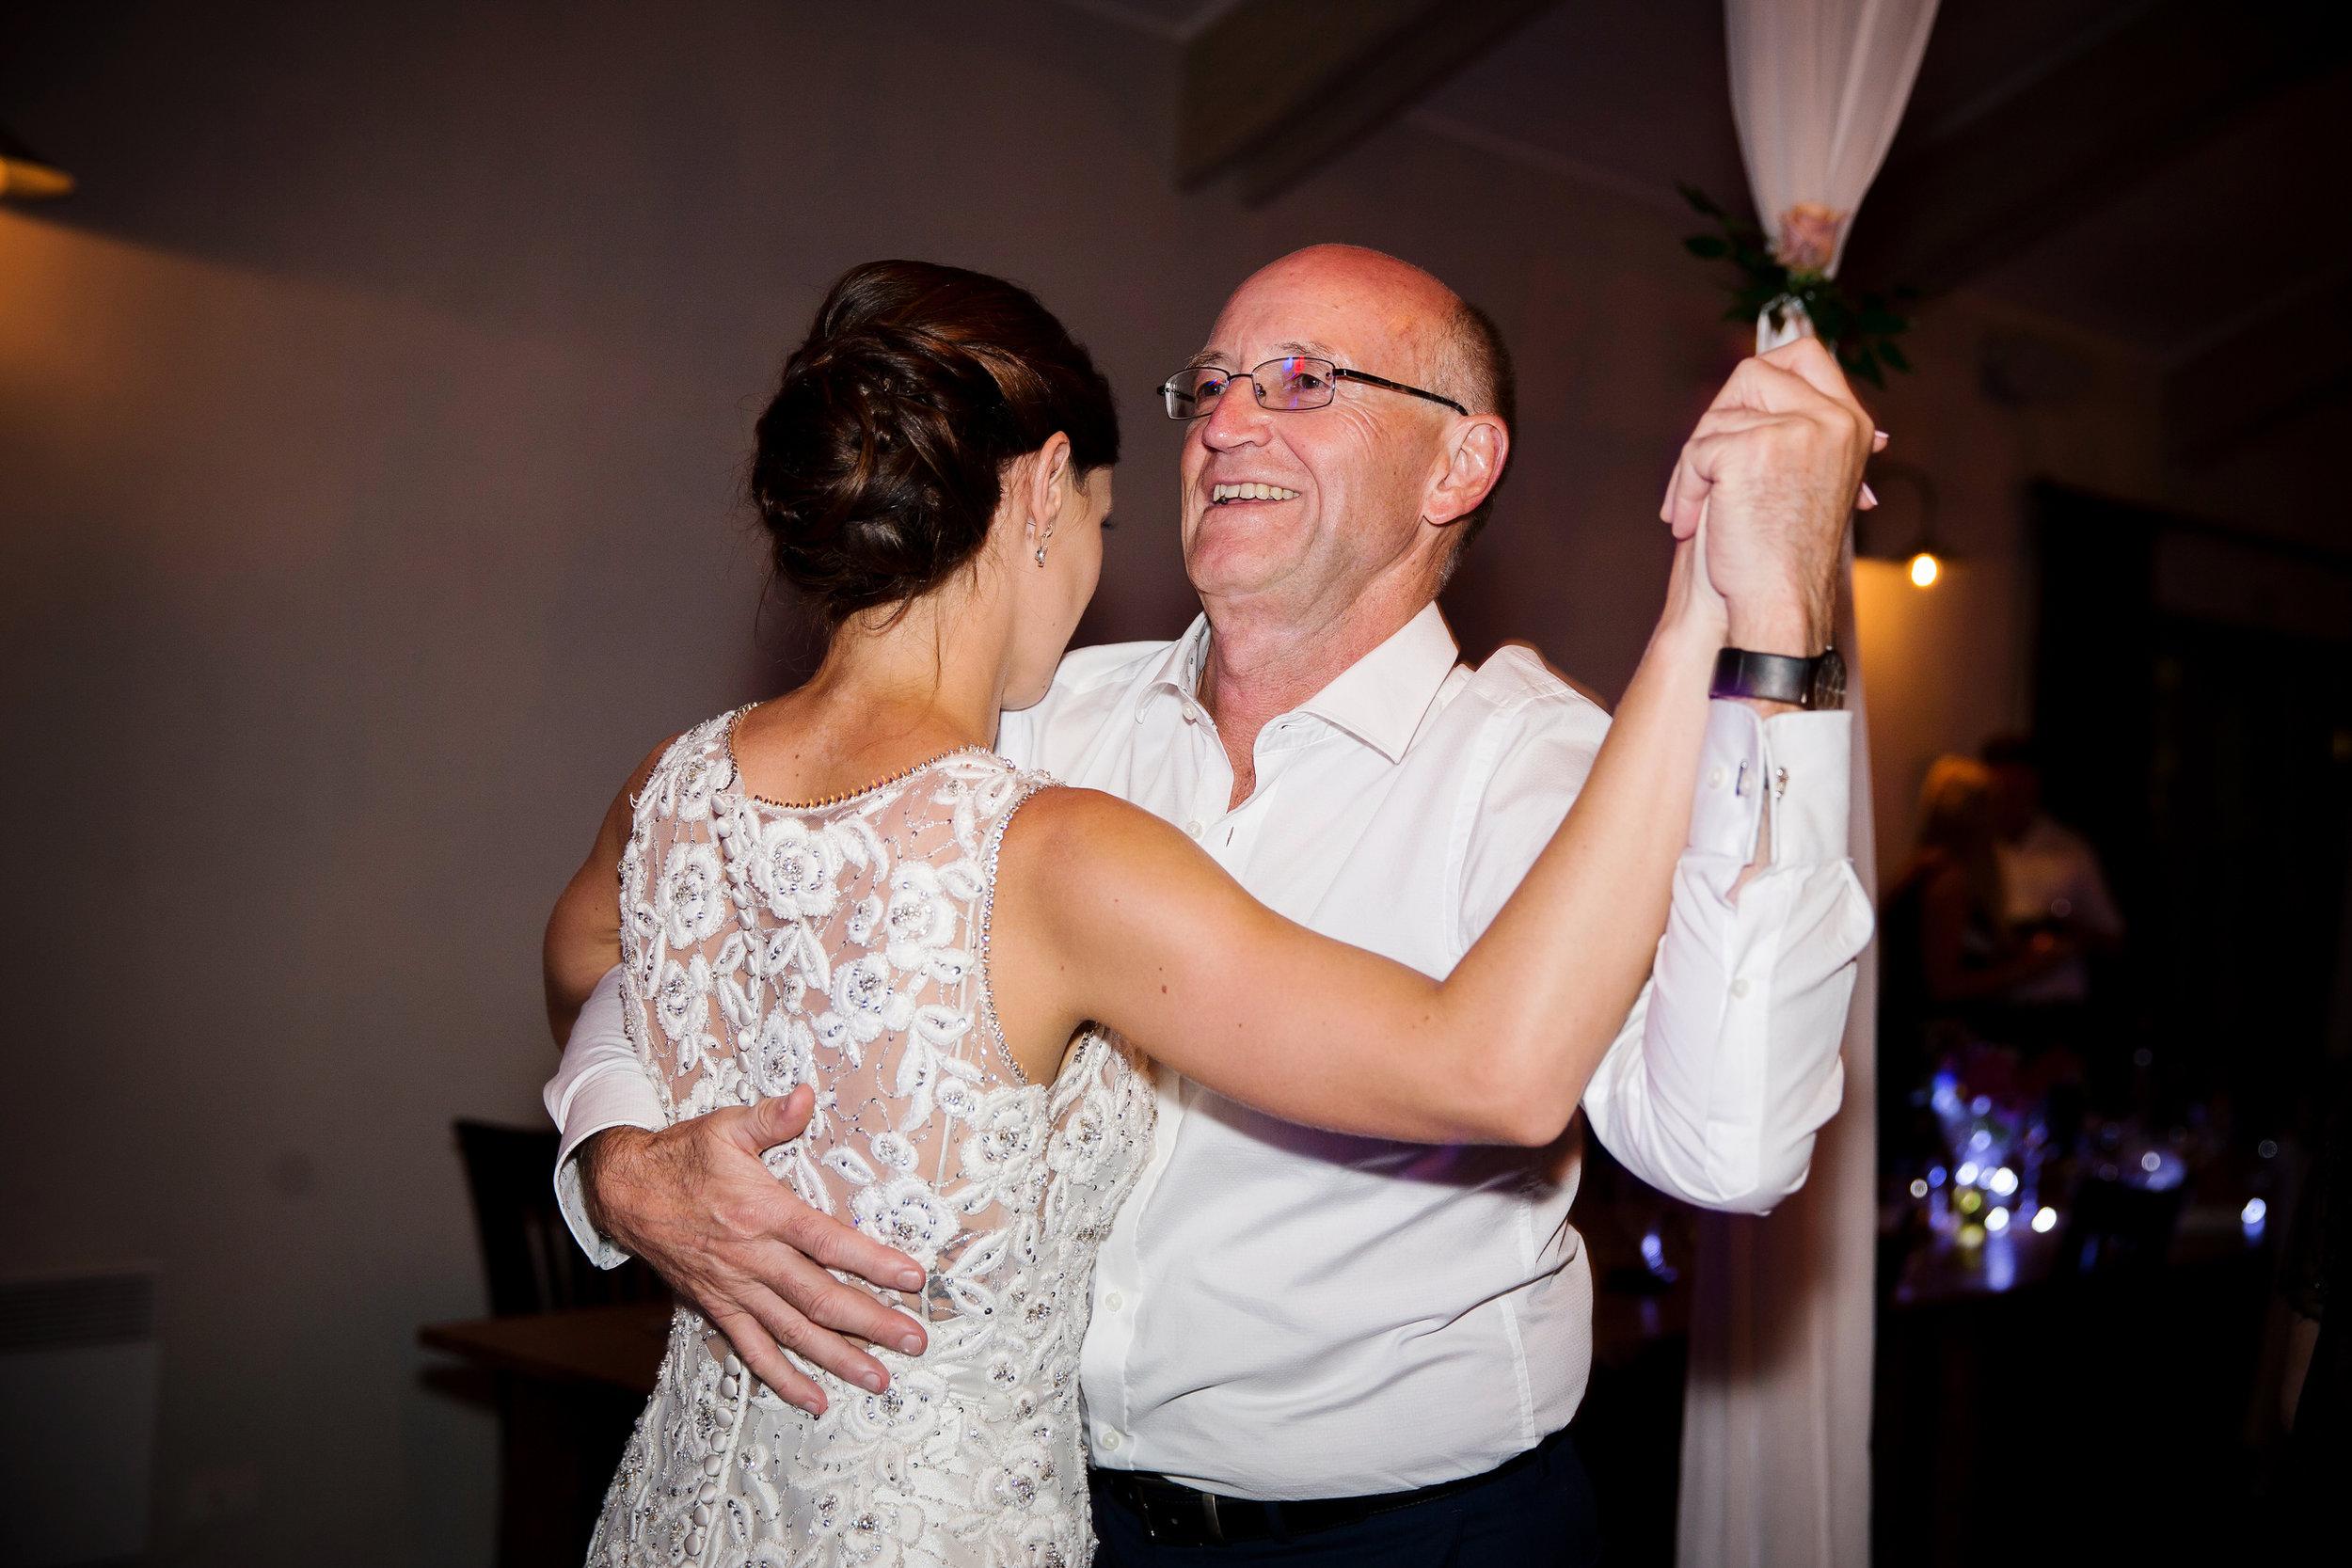 Martinborough-Poppies-Wedding-Caine-Eloise-Toni-Larsen-0165.jpg